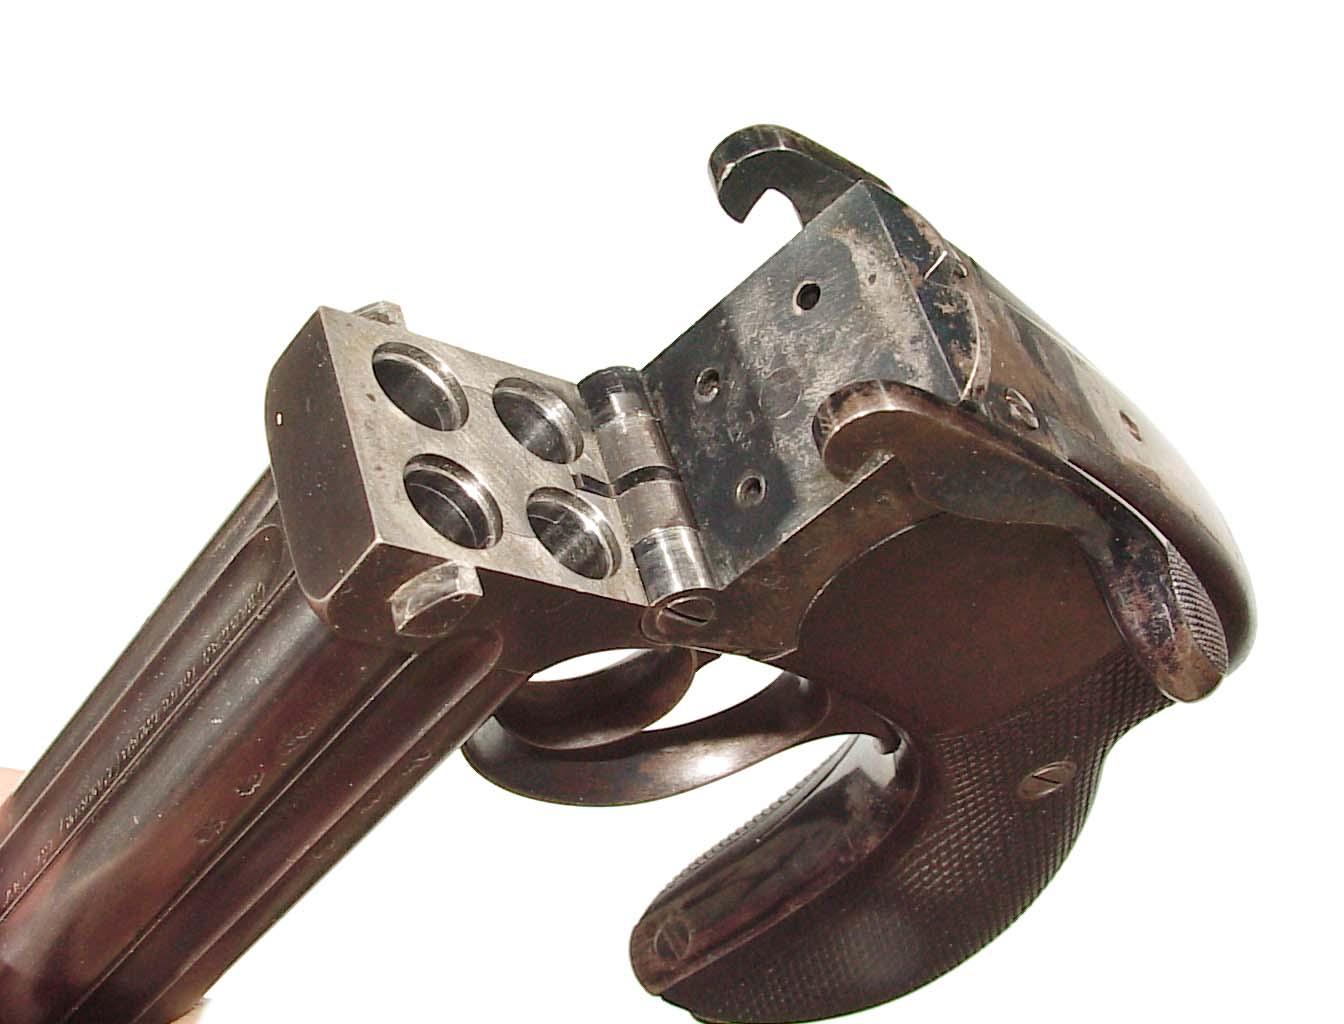 Monty Whitley Inc Charles Lancaster 4 Barrel Pistol In